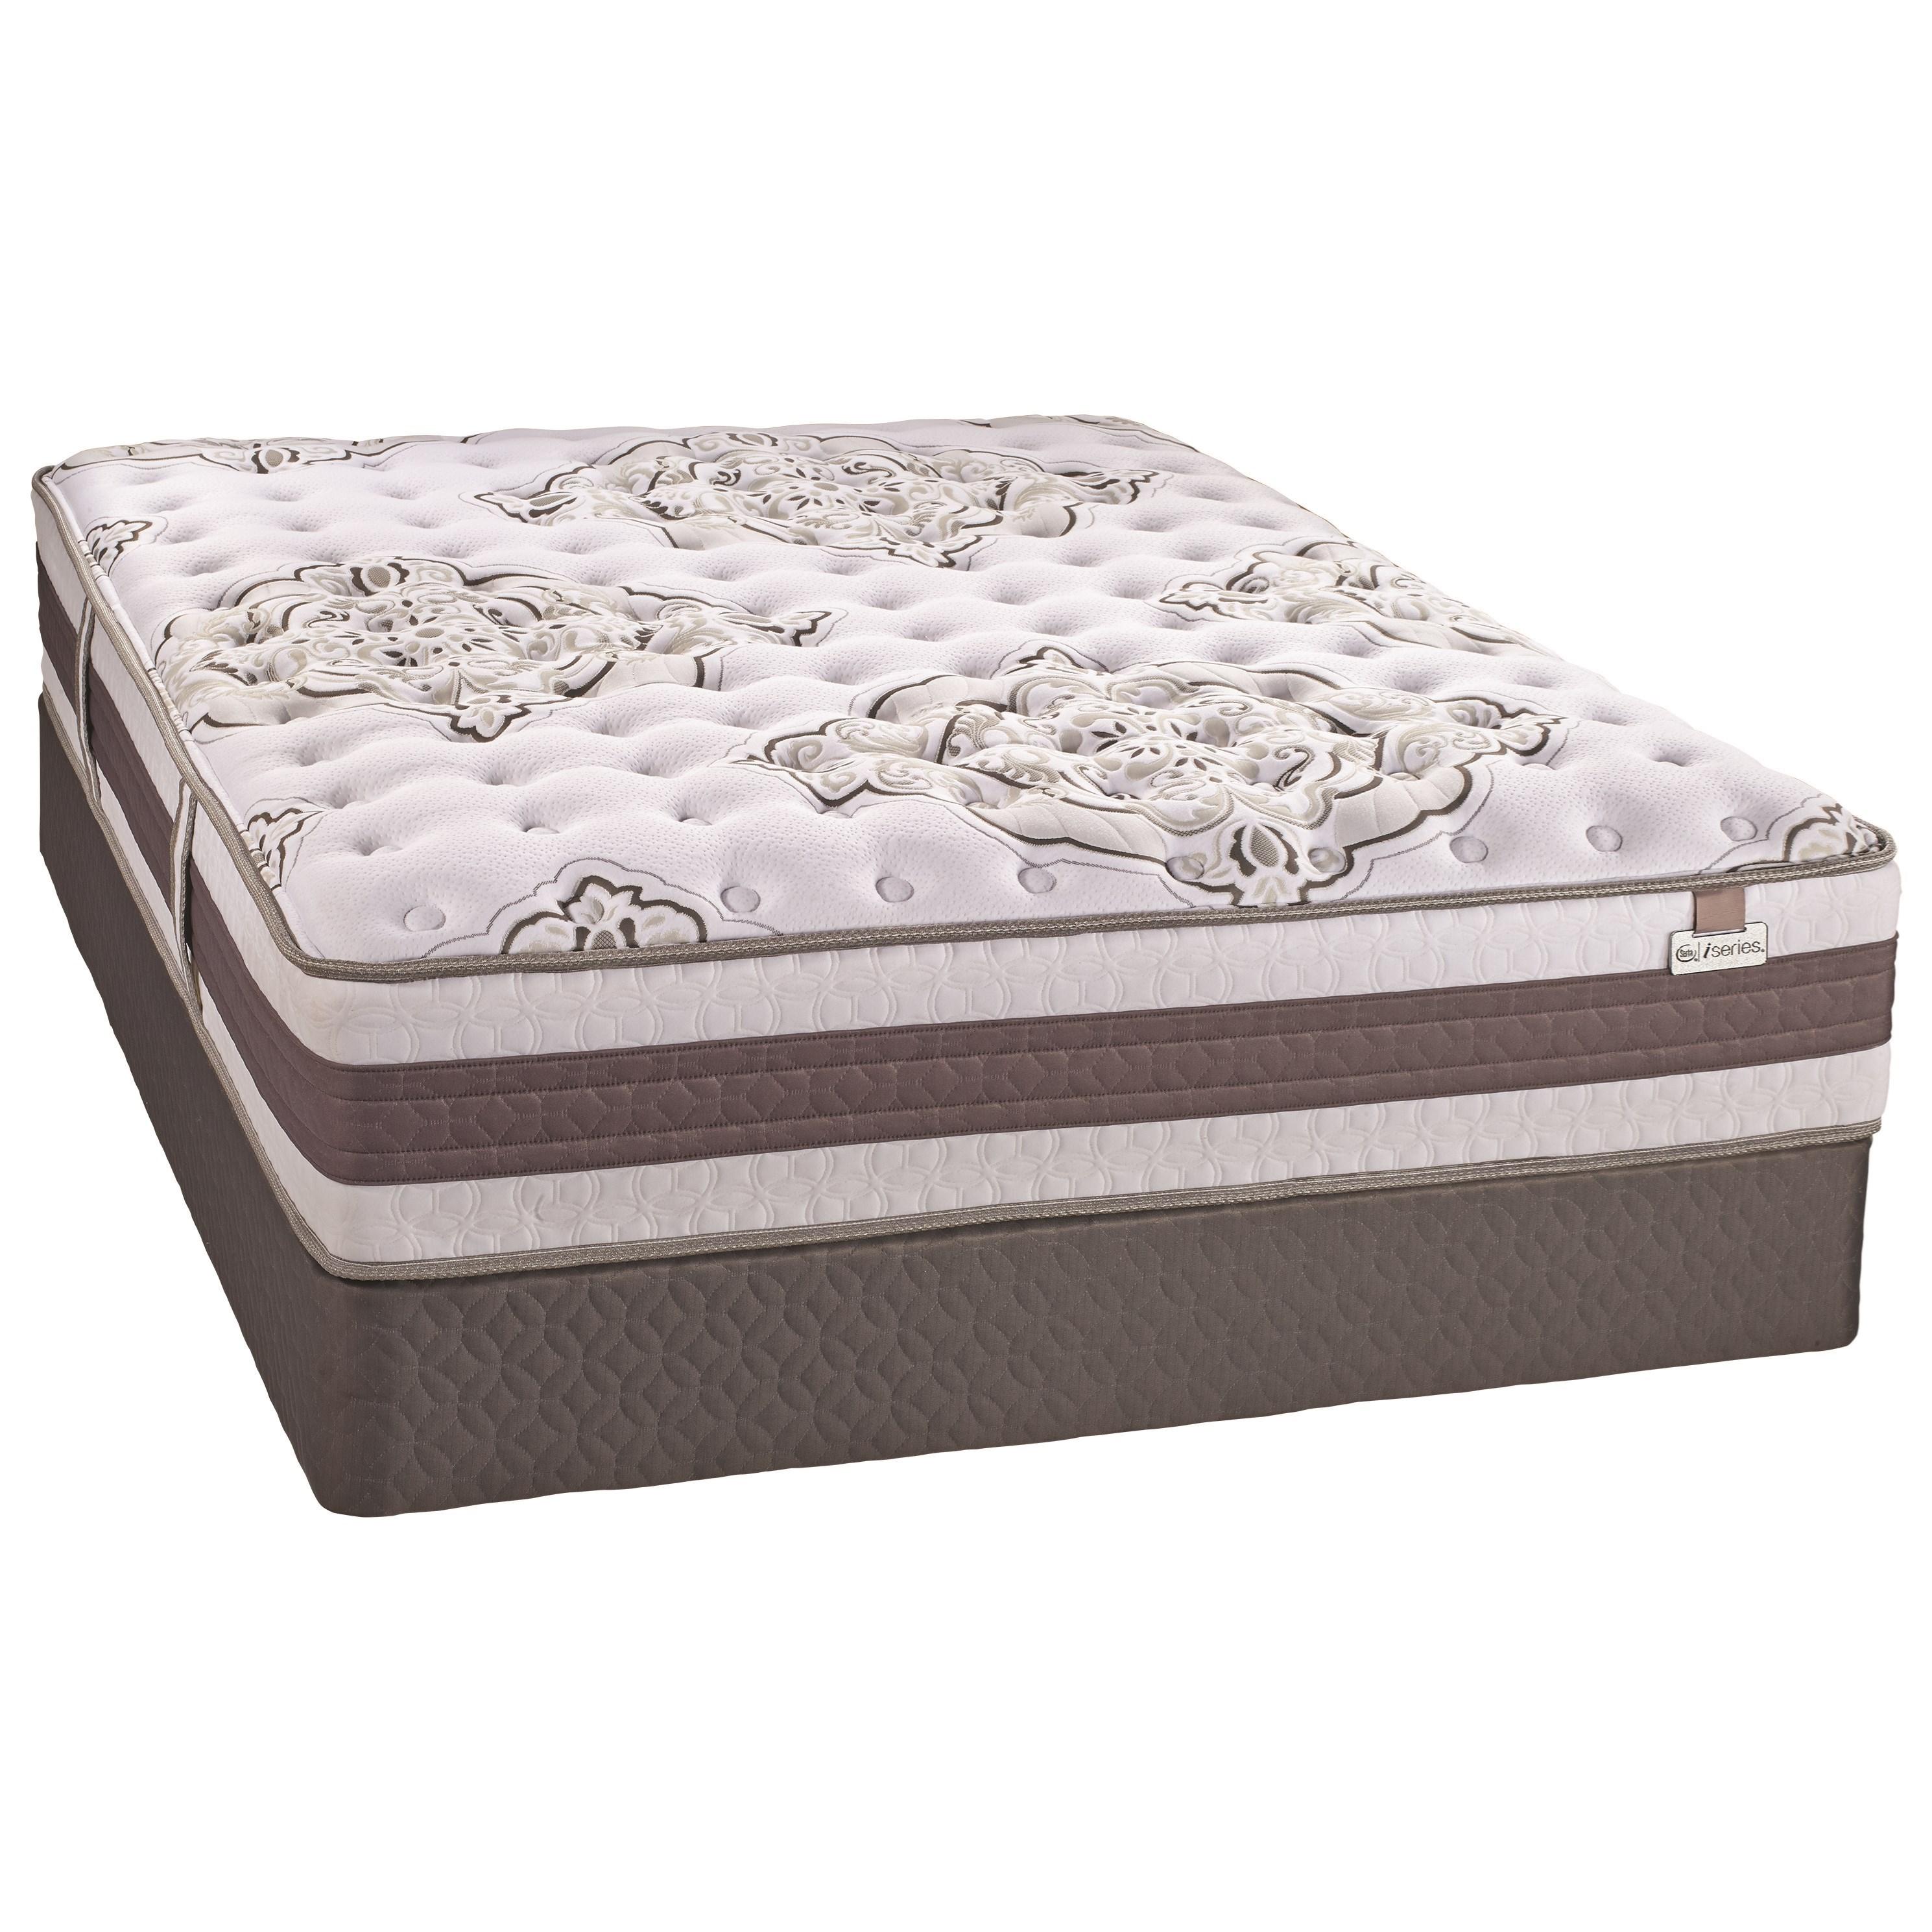 queen the bedrooms johns kingston mattress product standard futon futons